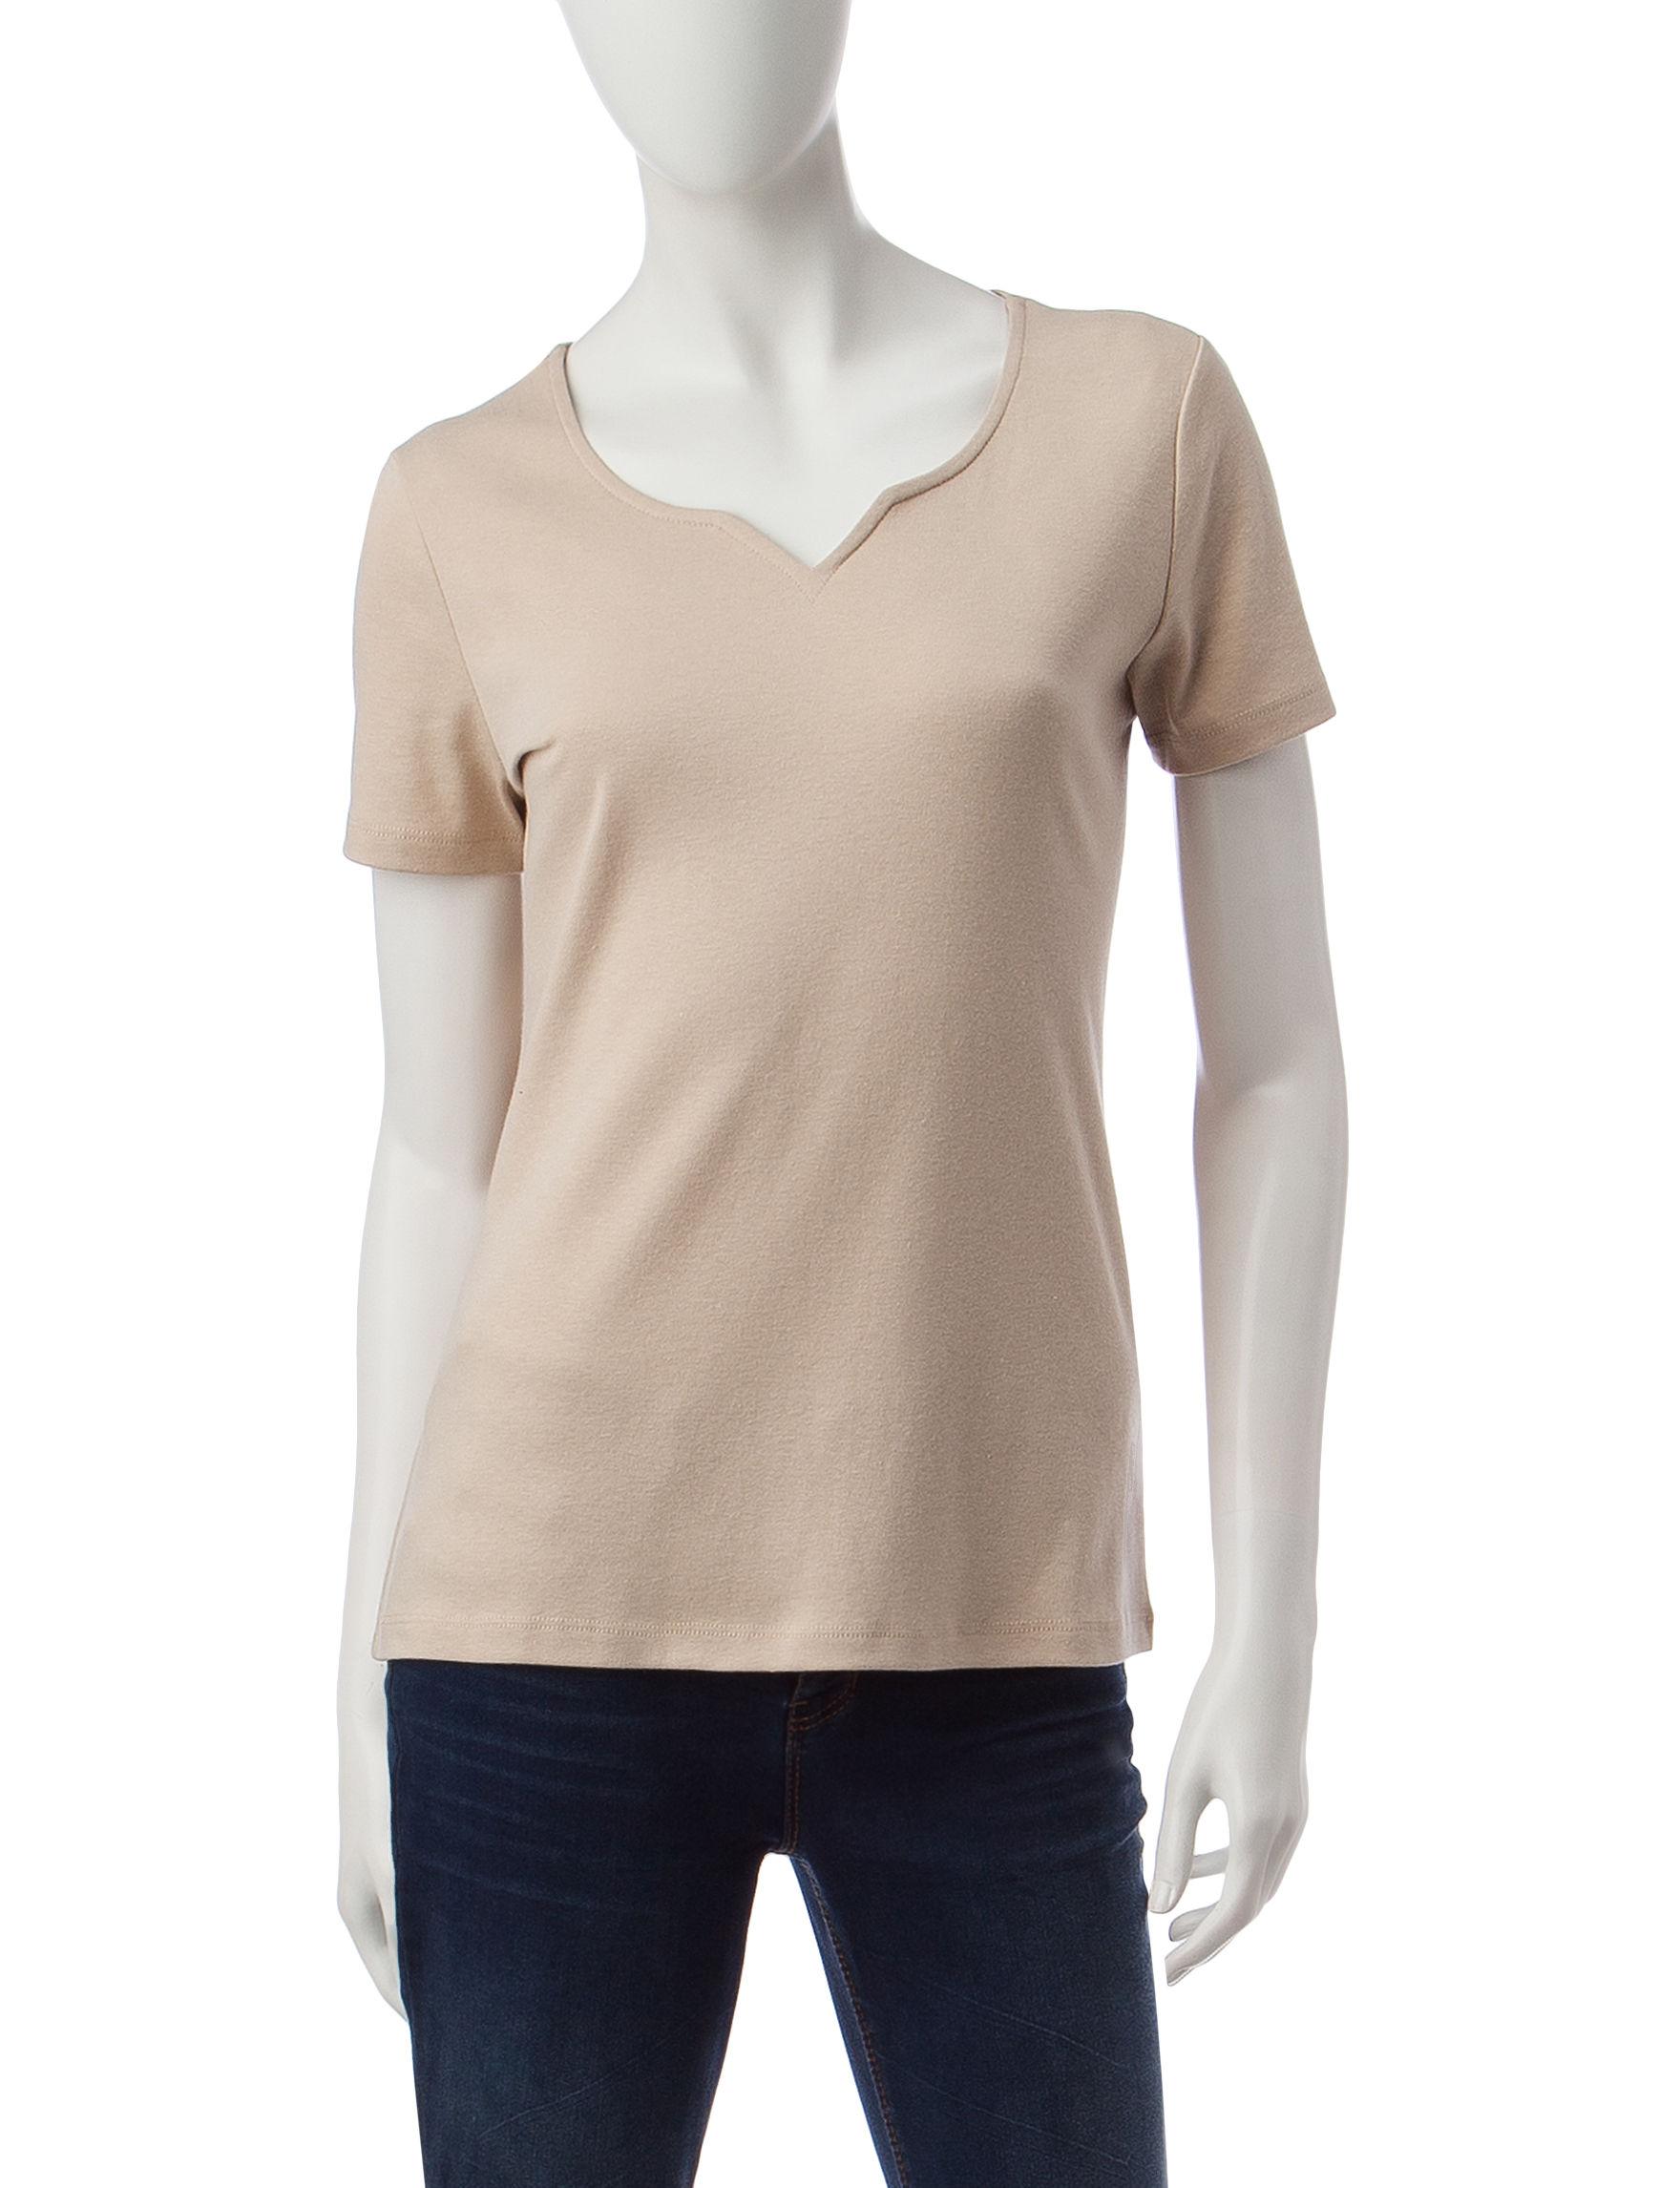 Rebecca Malone Tan Shirts & Blouses